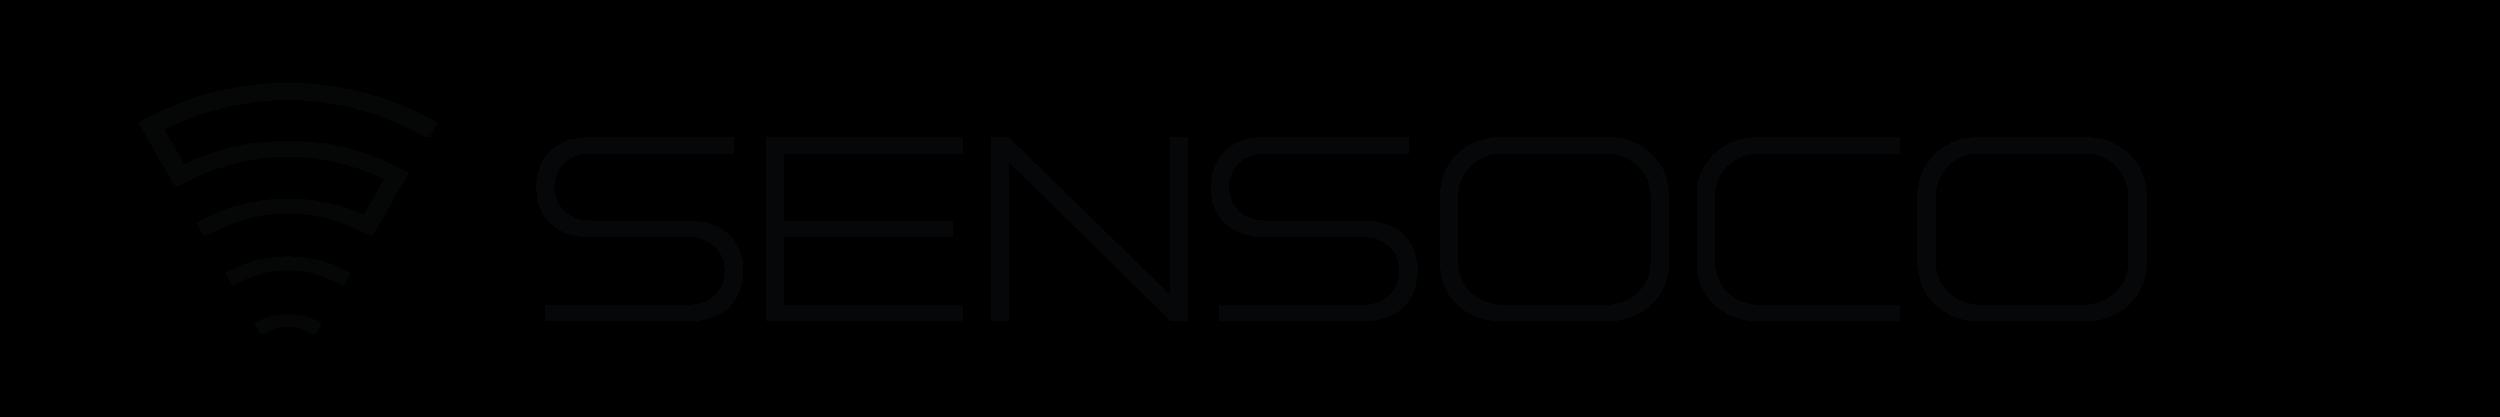 sensoco-registered-logo_symbol.png